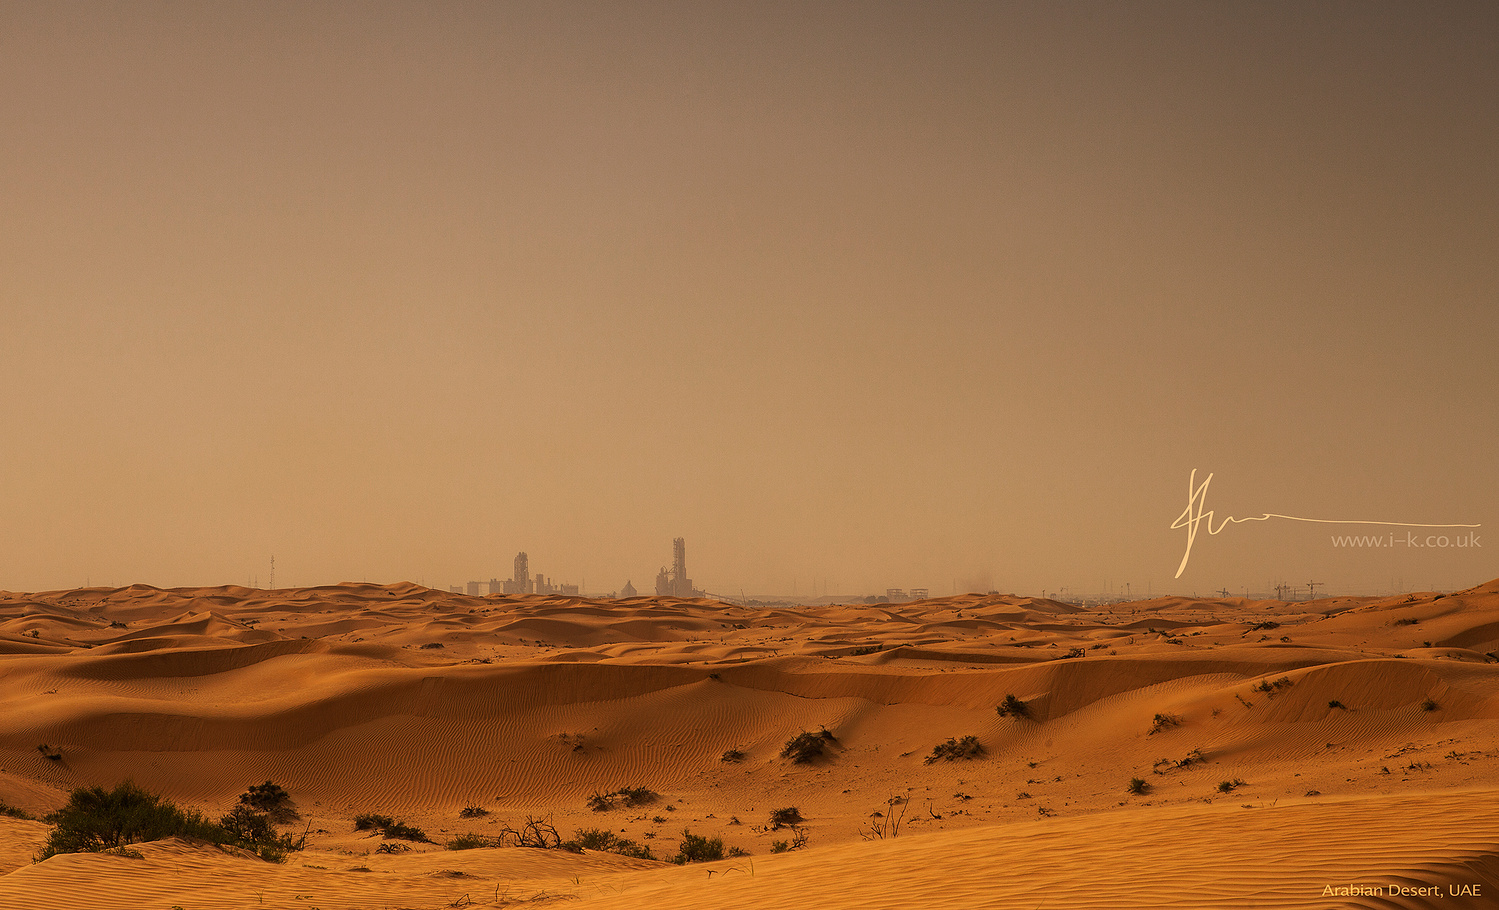 Martian Landscape by Imran Khan